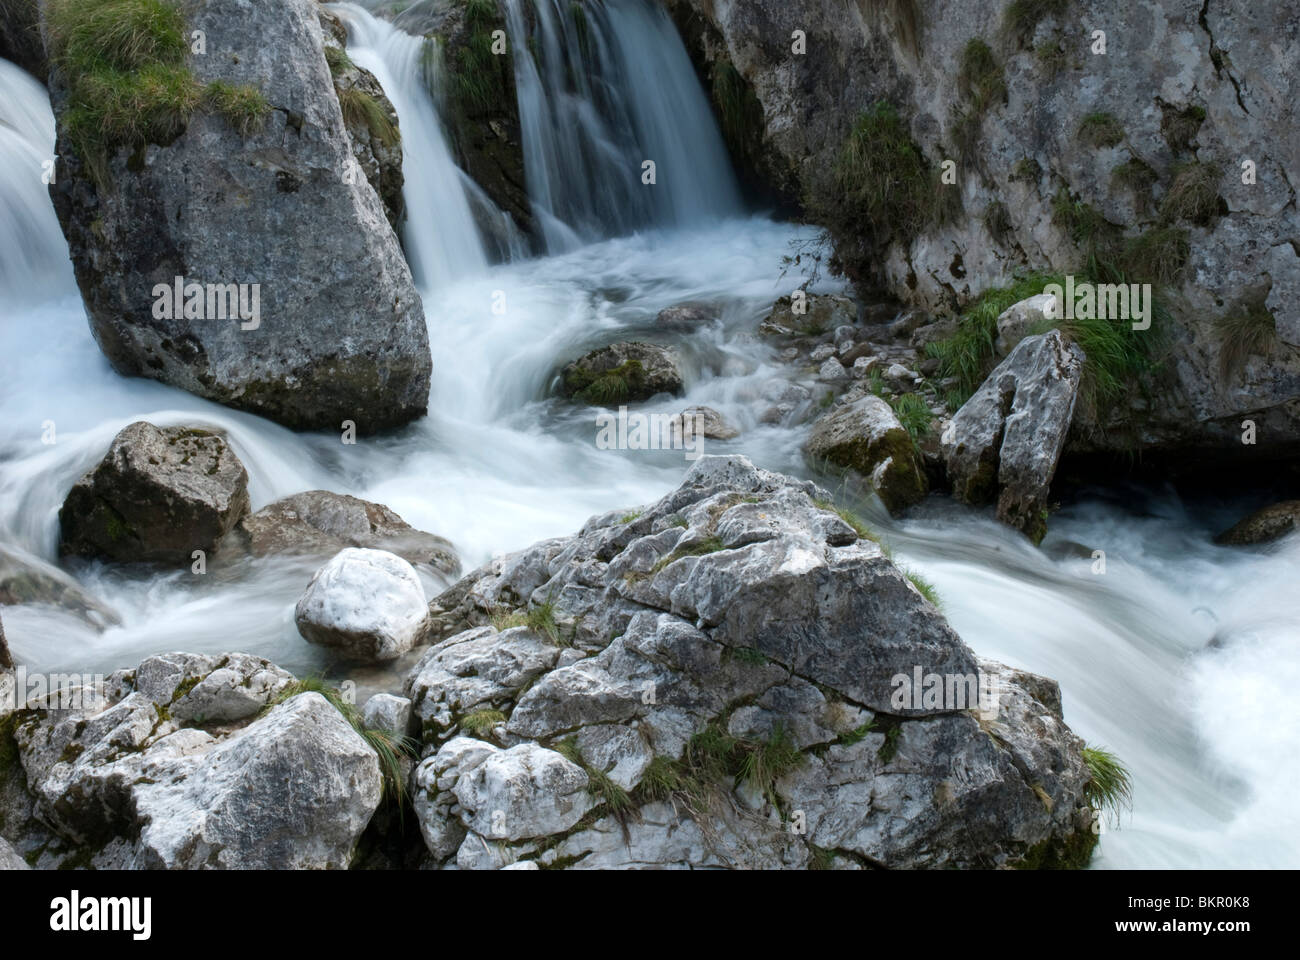 Stream & waterfall, Bulnes, Central Massif, Picos de Europa, Spain - Stock Image